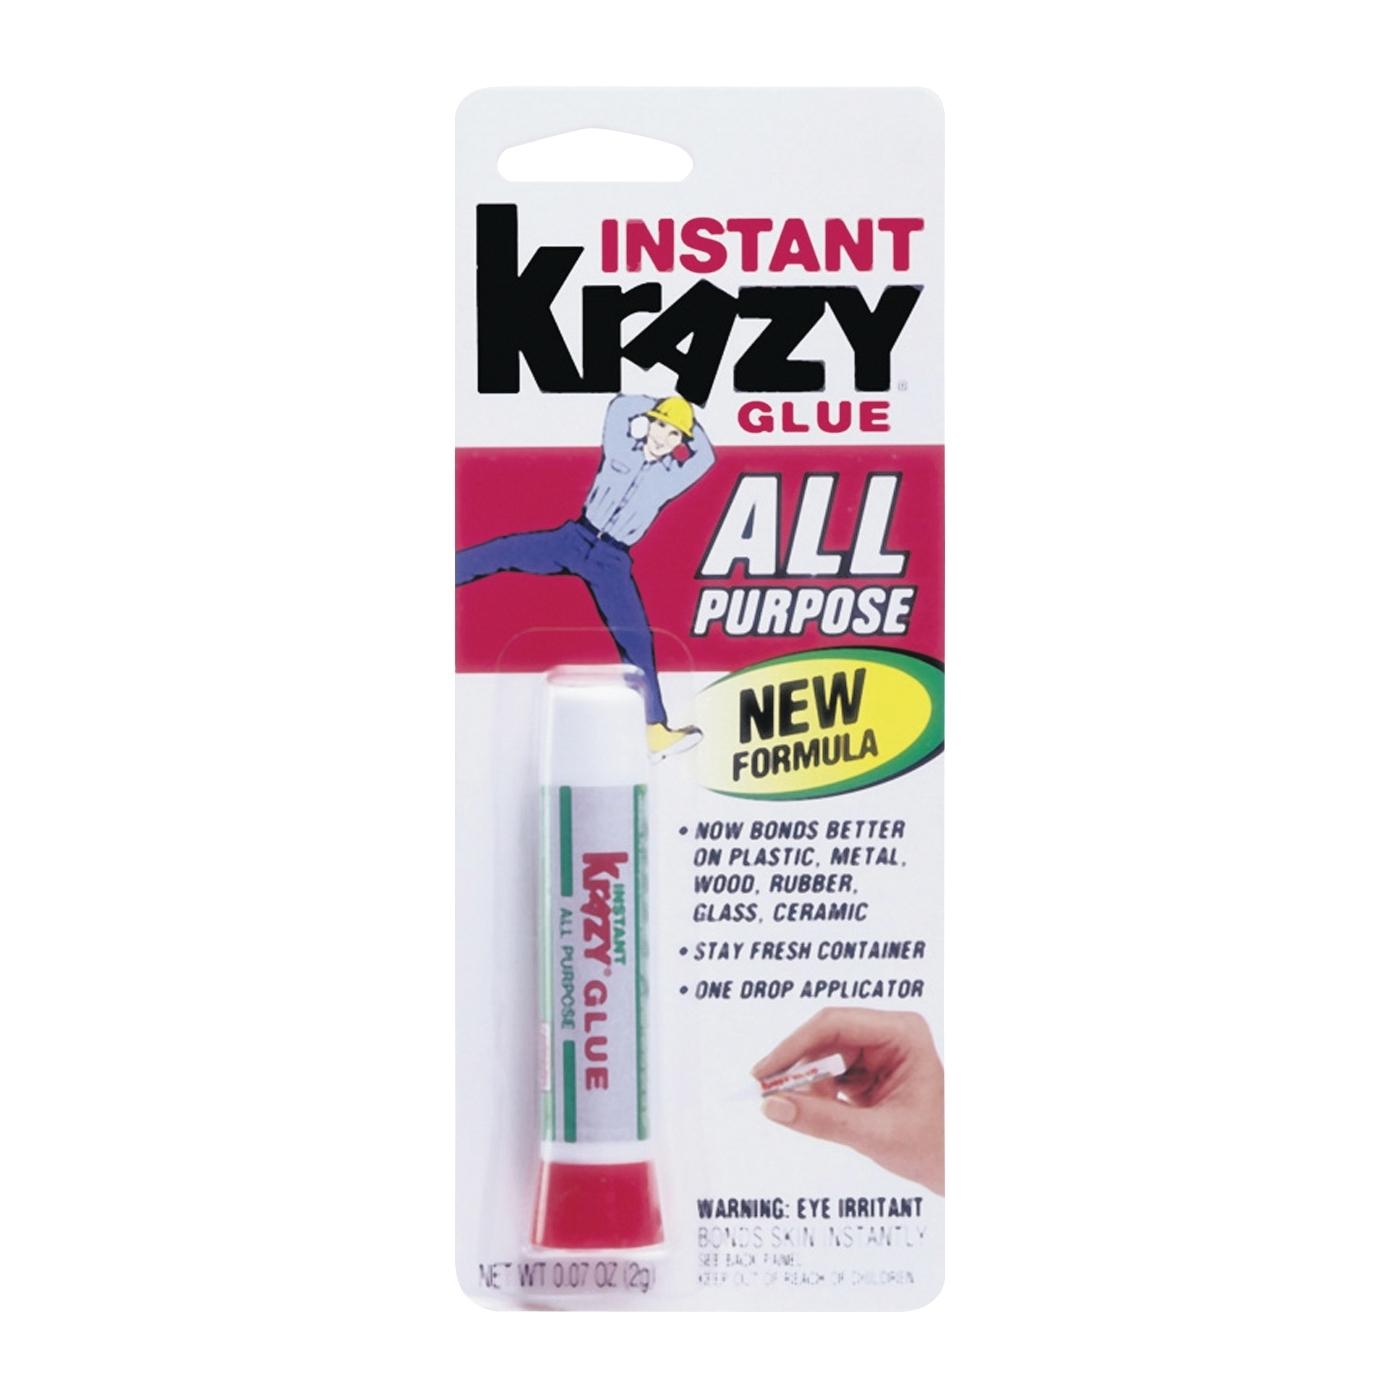 Picture of Krazy Glue KG58548R Super Glue, Liquid, Irritating, Clear, 2 g Package, Tube